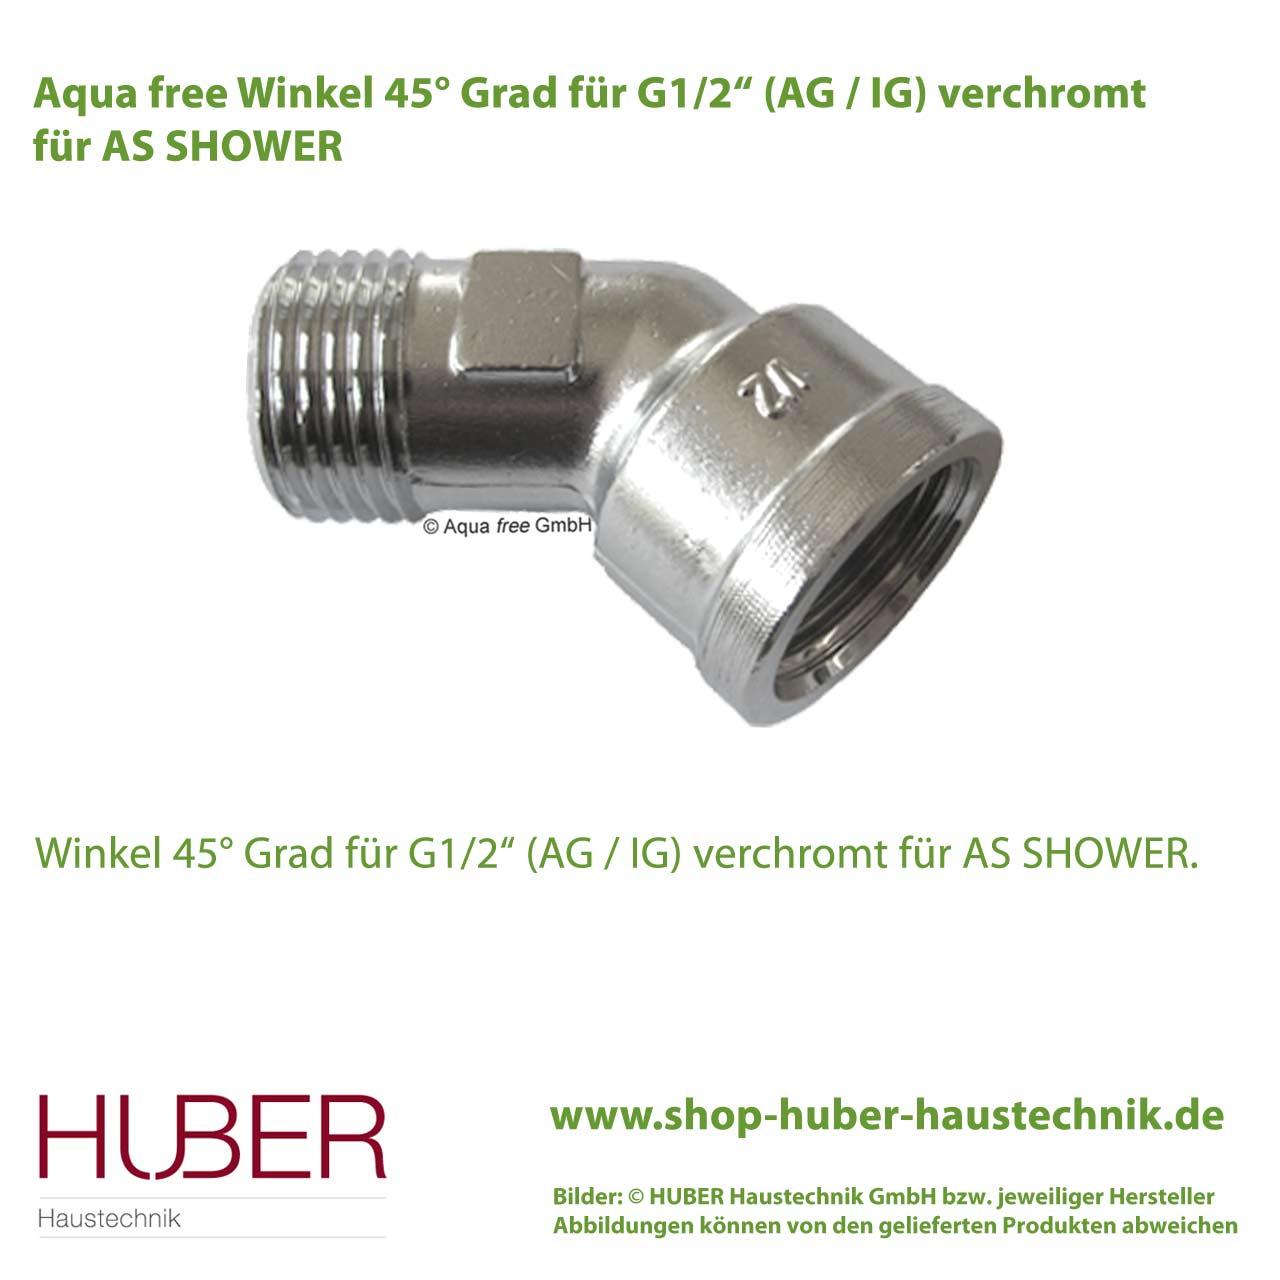 "aqua free winkel 45° grad für g1/2"" (ag / ig) verchromt | huber"